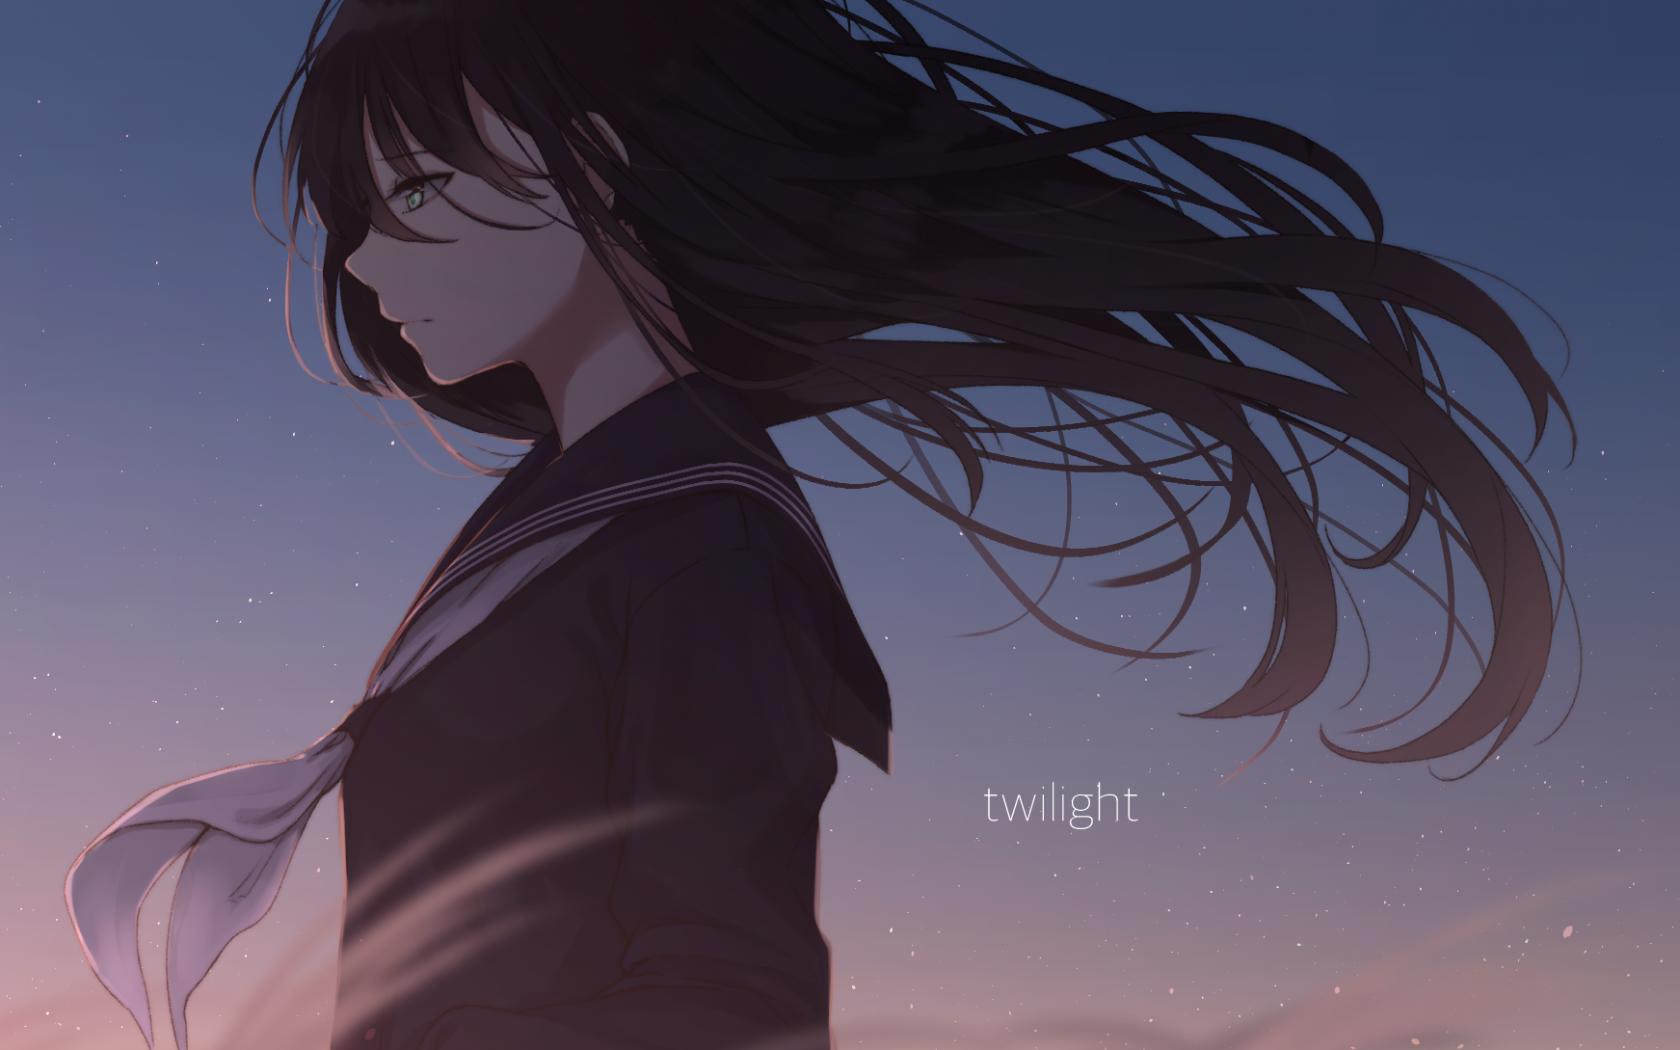 Anime Girl, Sad, School Uniform, Windy, Black Hair, - Dark Sad Anime Girl - HD Wallpaper